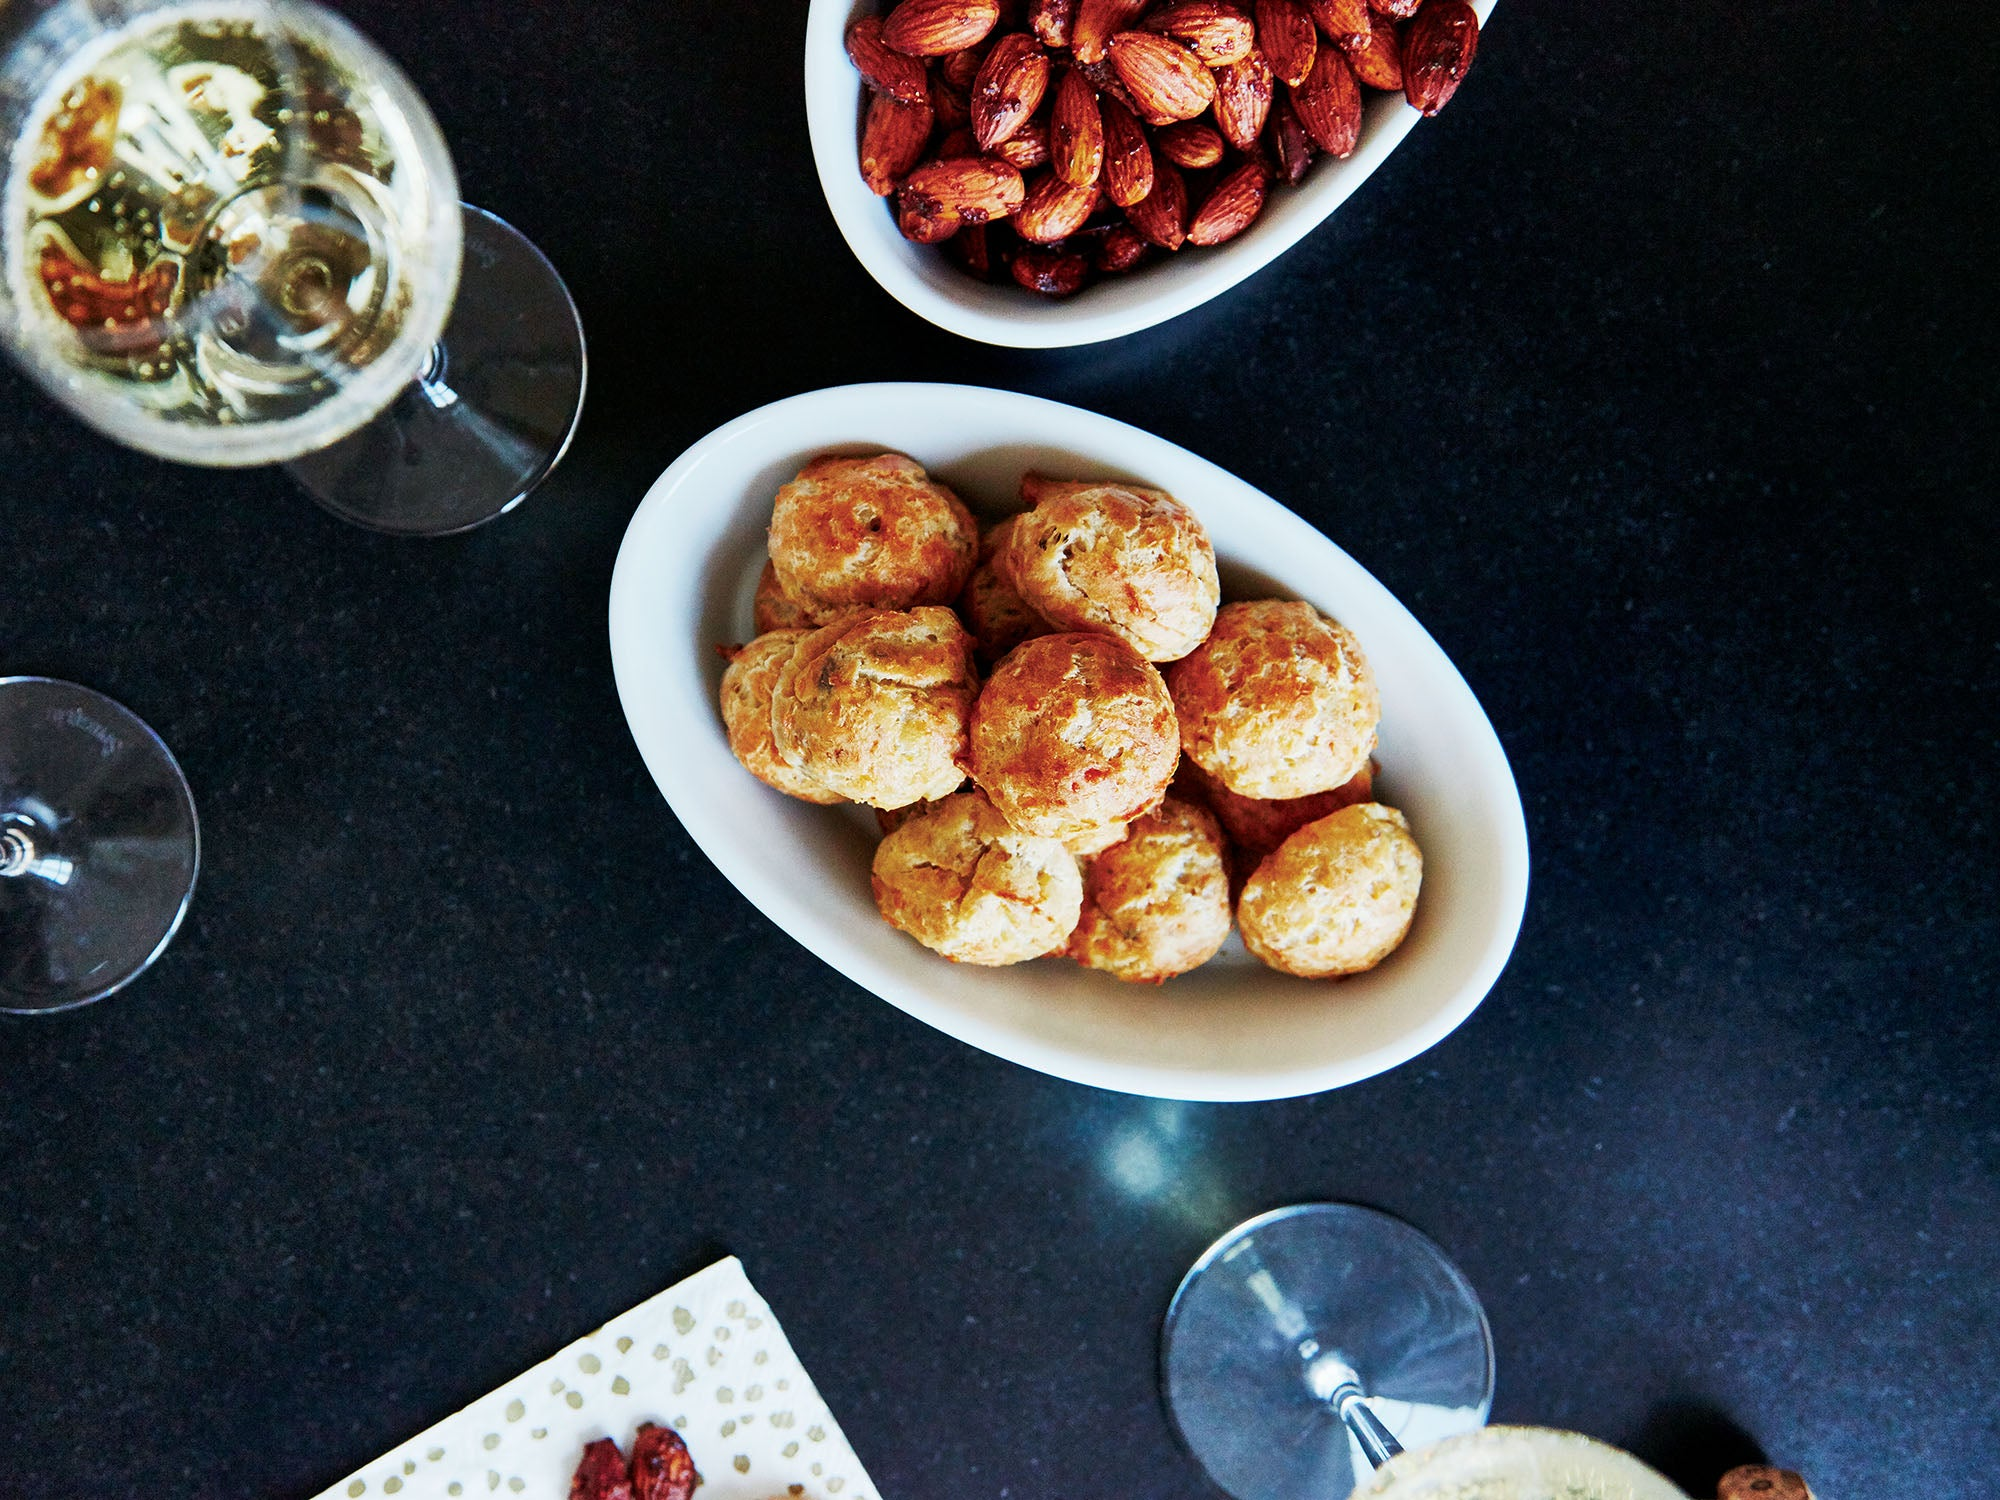 Make These Fancy Riffs on Party Snacks to Treat Yo'self